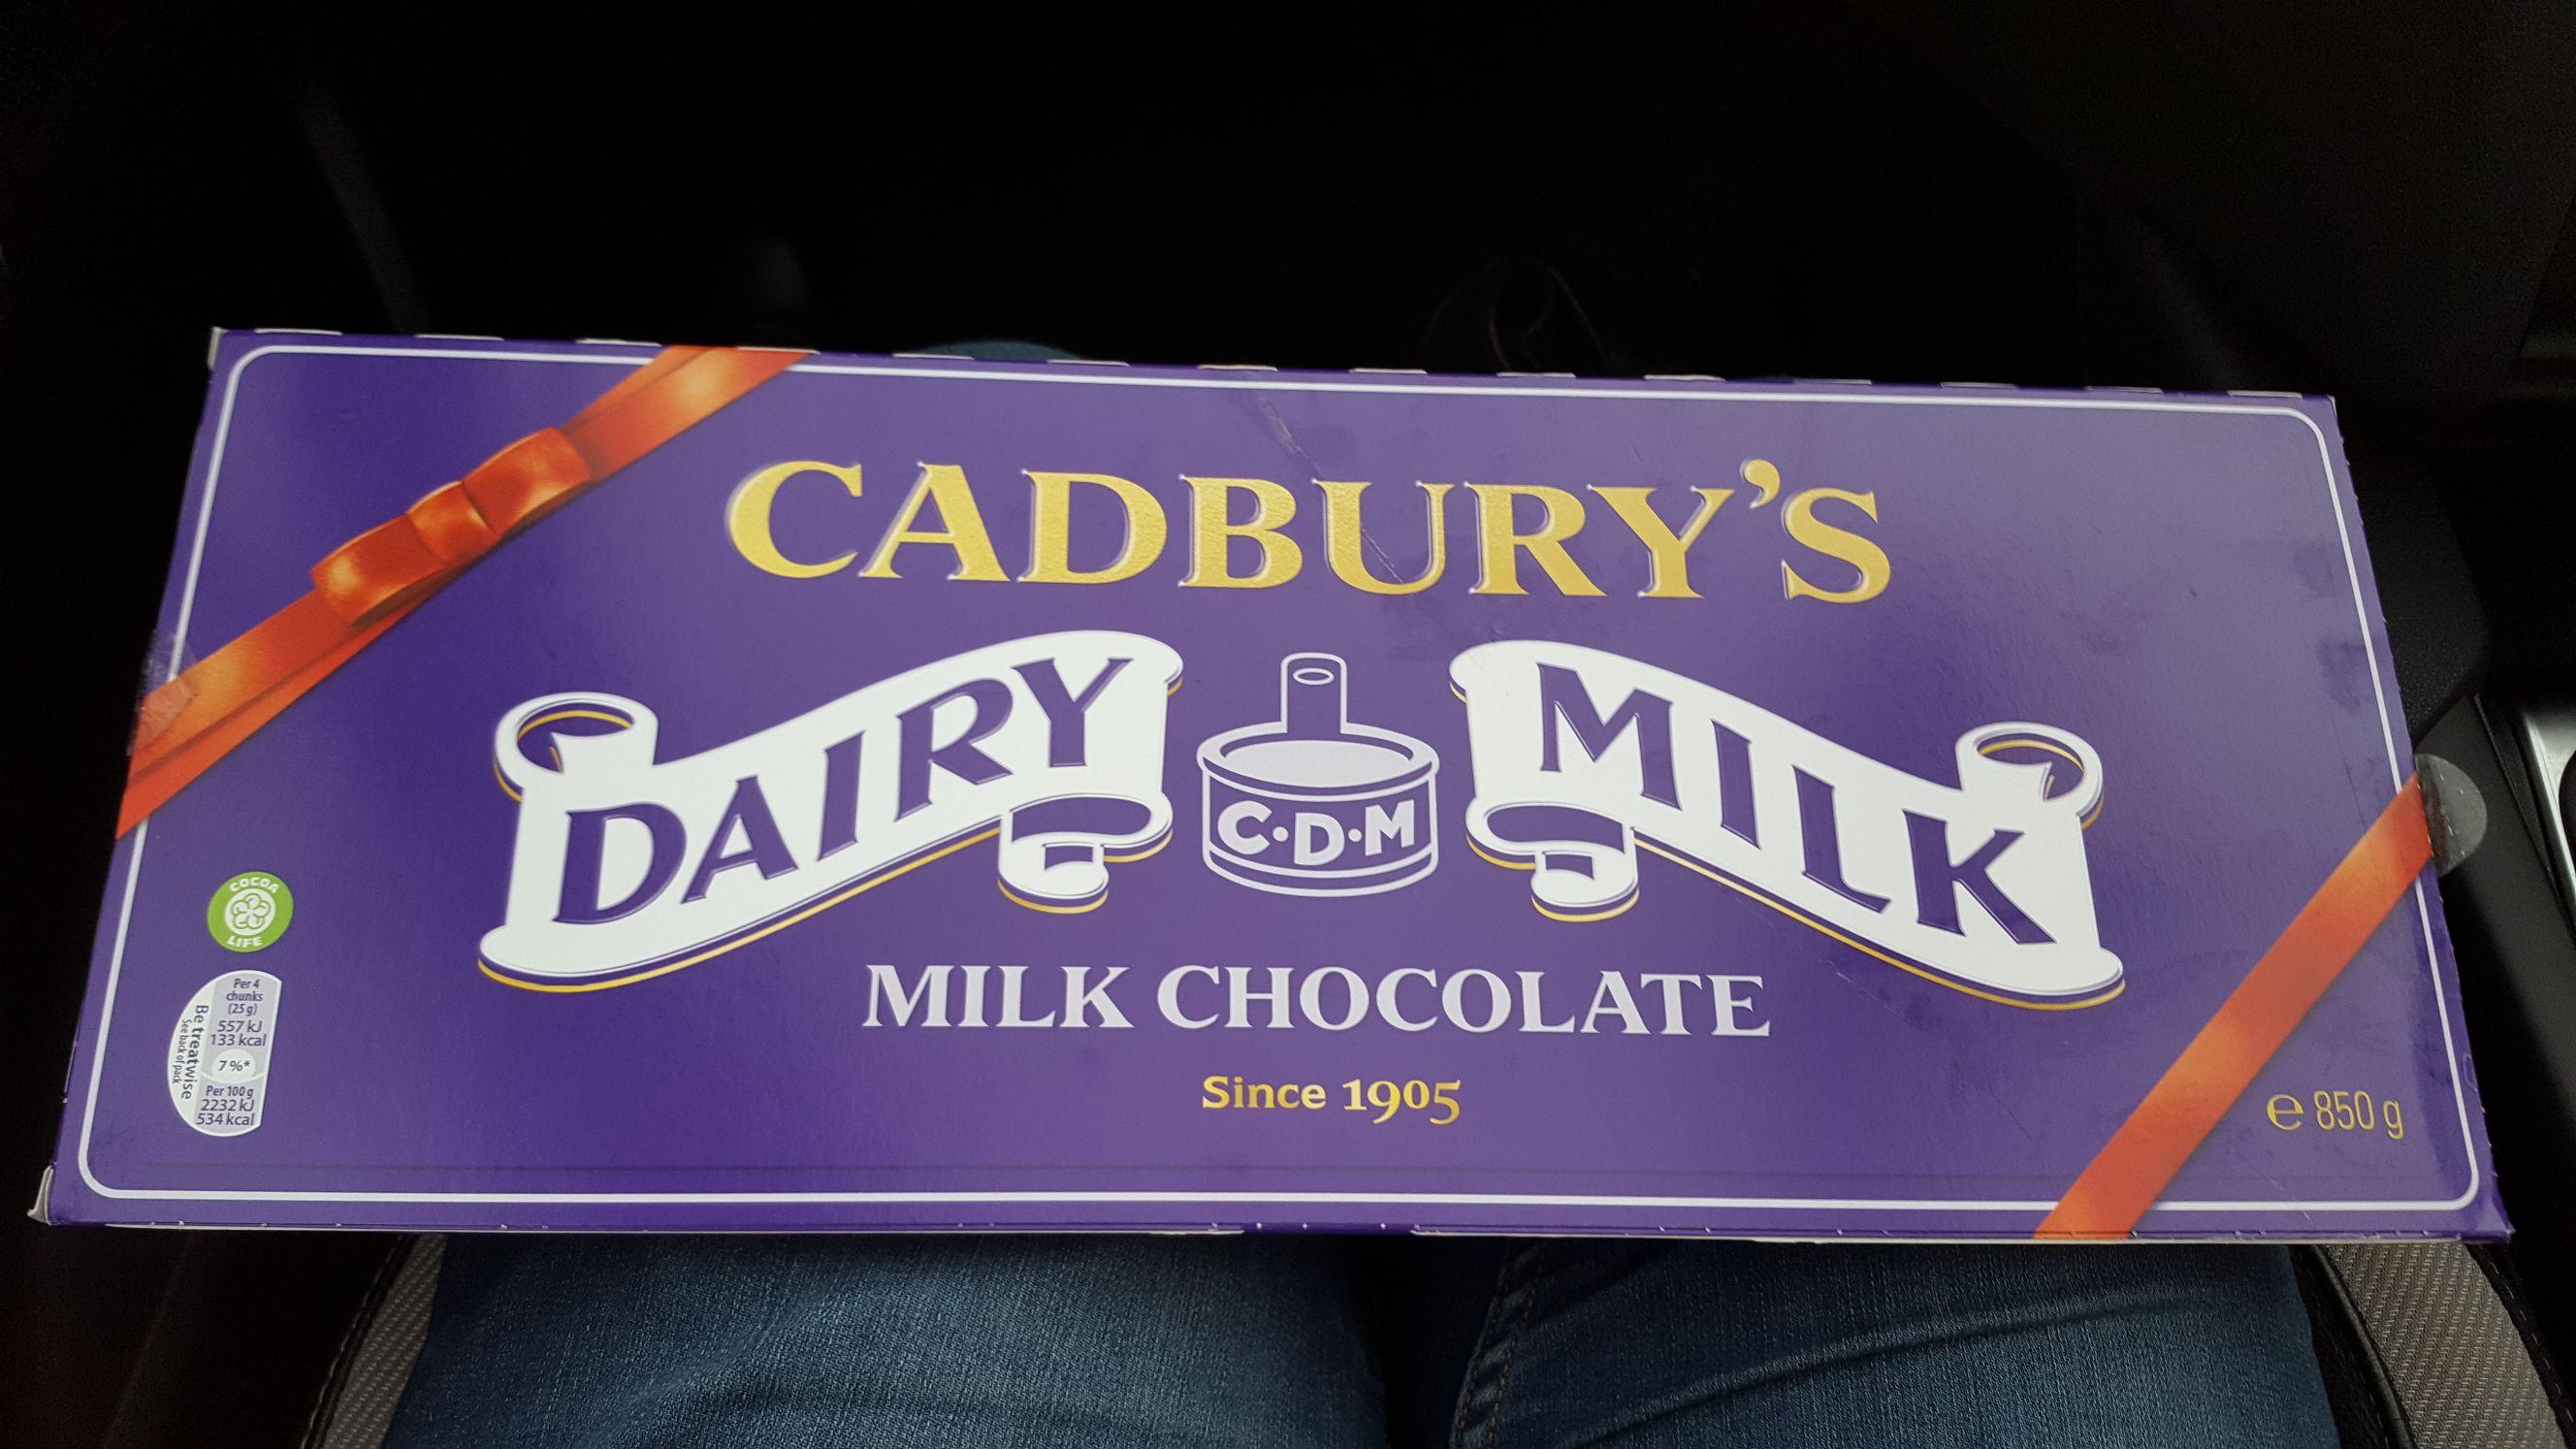 Cadbury Dairy Milk 850g instore asda £2.50